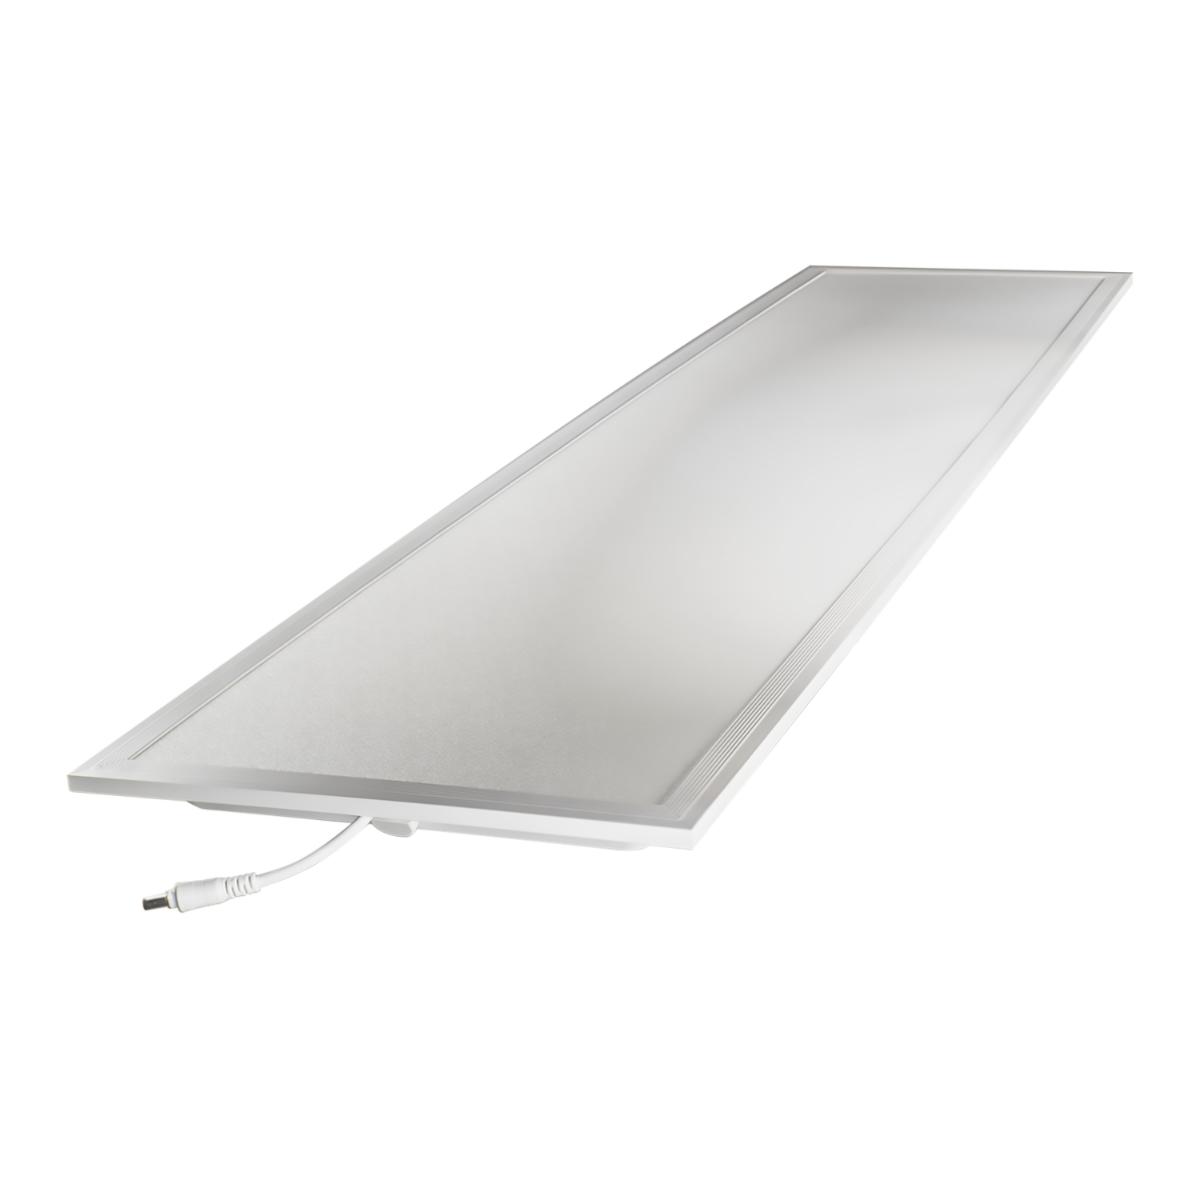 Noxion LED panel Econox 32W Xitanium DALI 30x120cm 6500K 4400lm UGR <22 | Dali dimbar - daglys - erstatter 2x36W